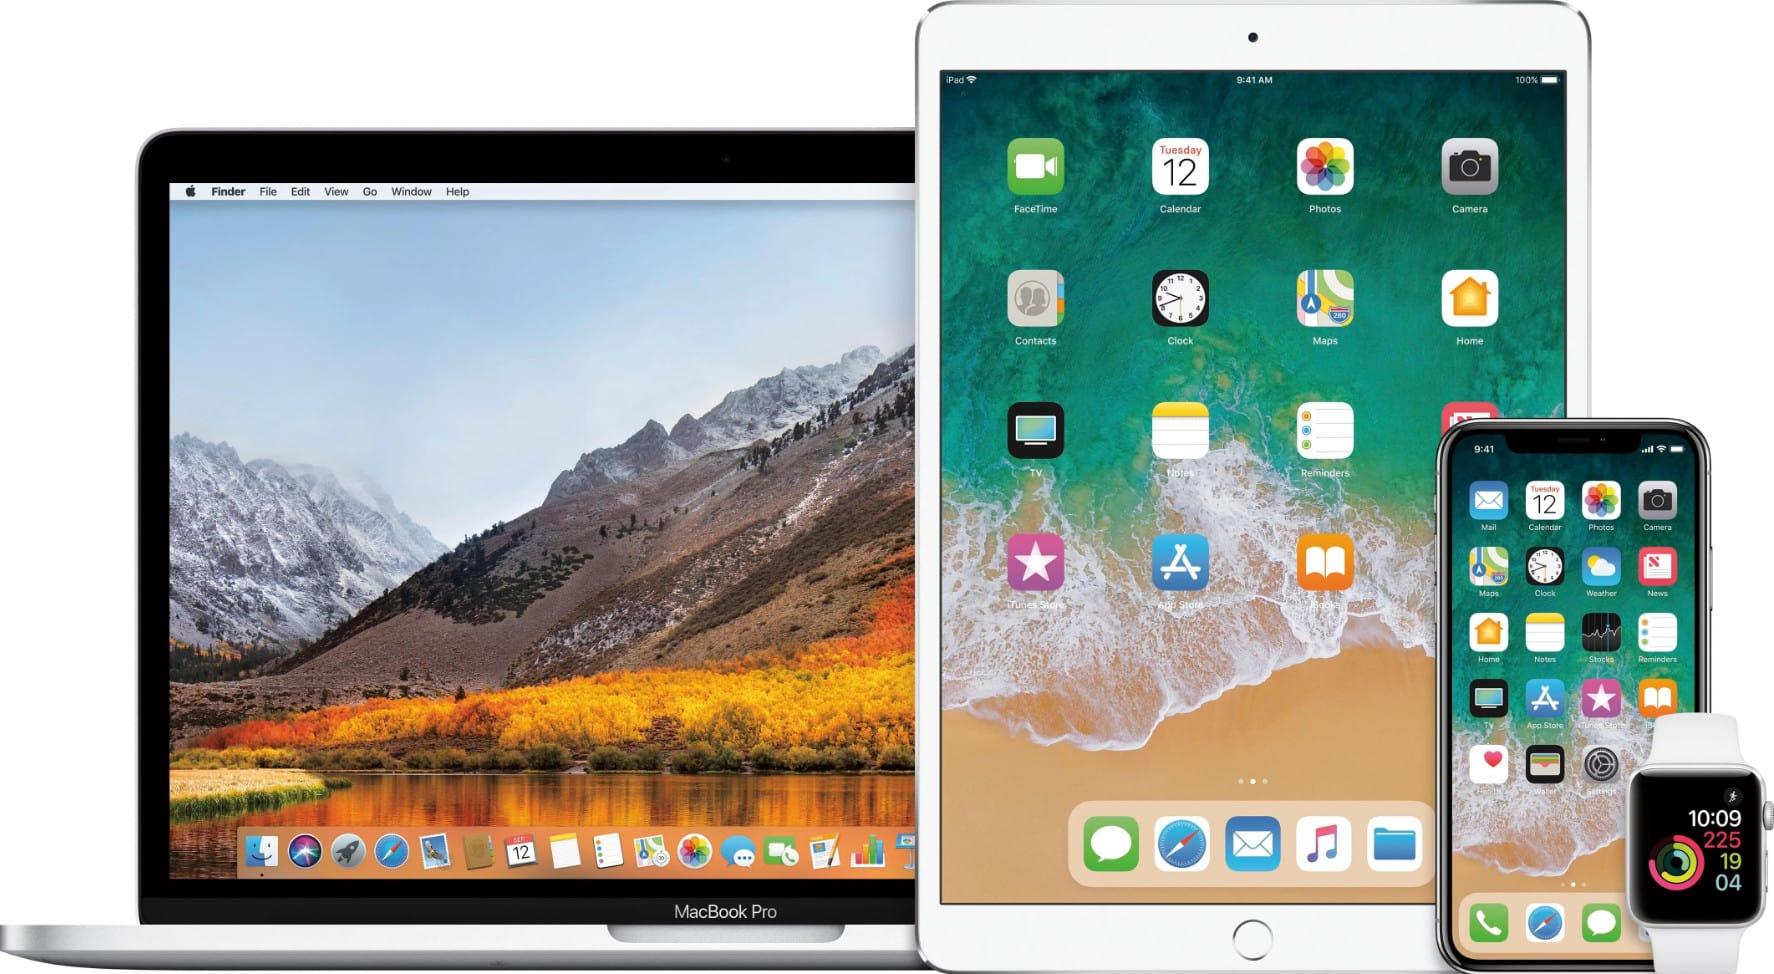 MacbBook iPhone iPad